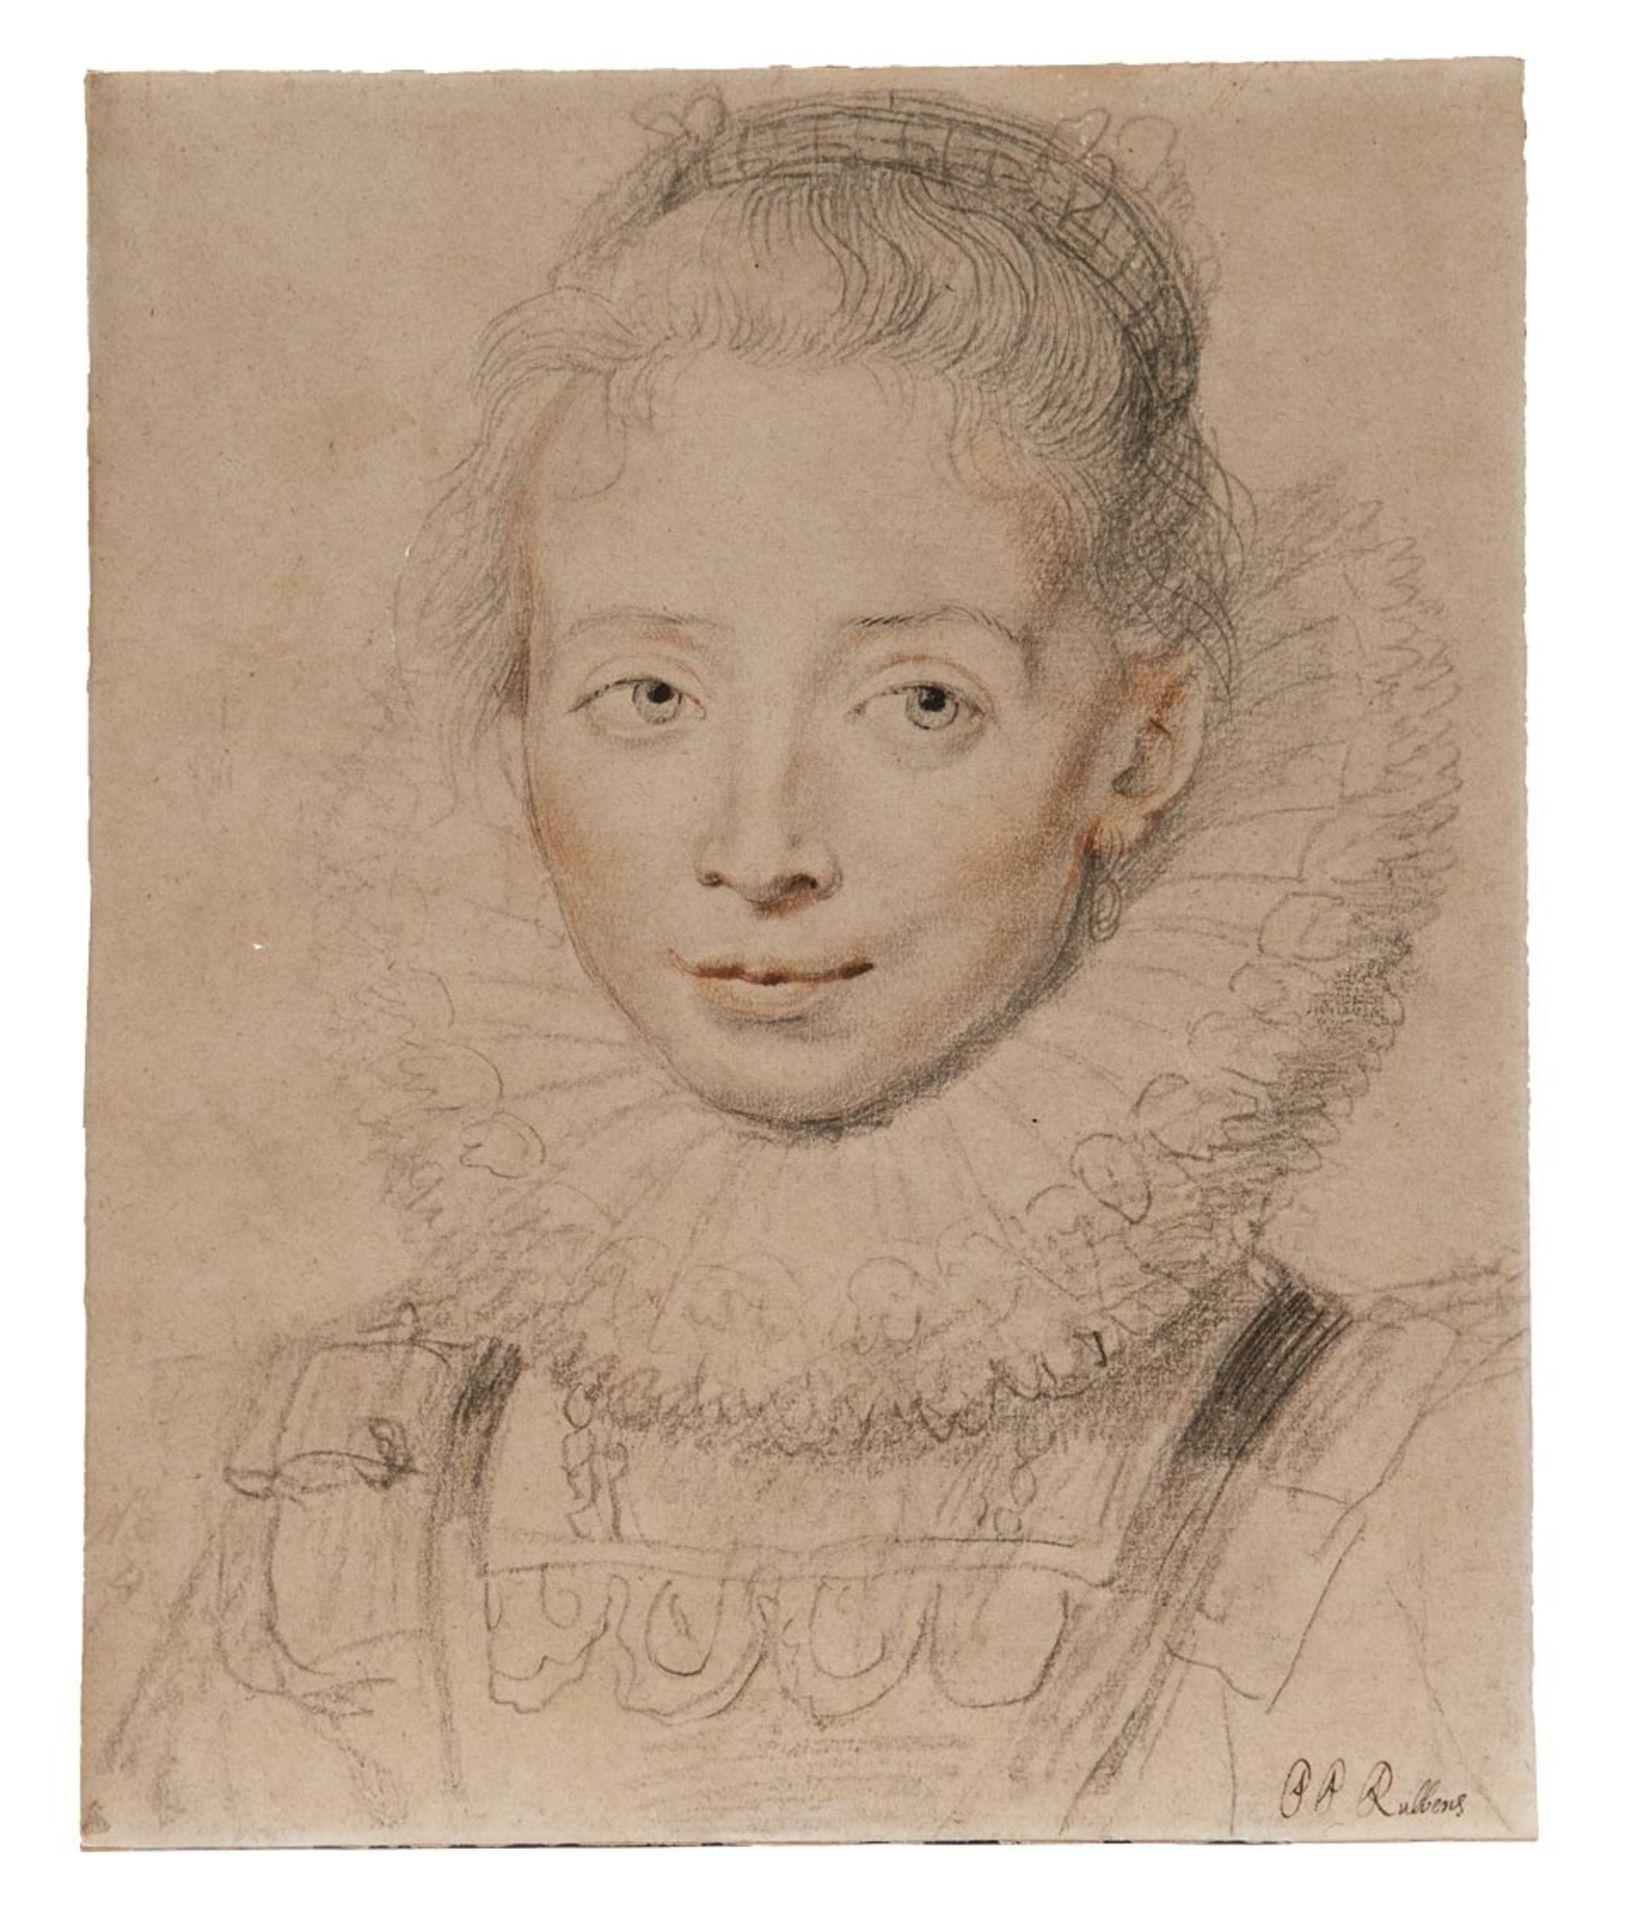 Rubens, Peter Paul - nach